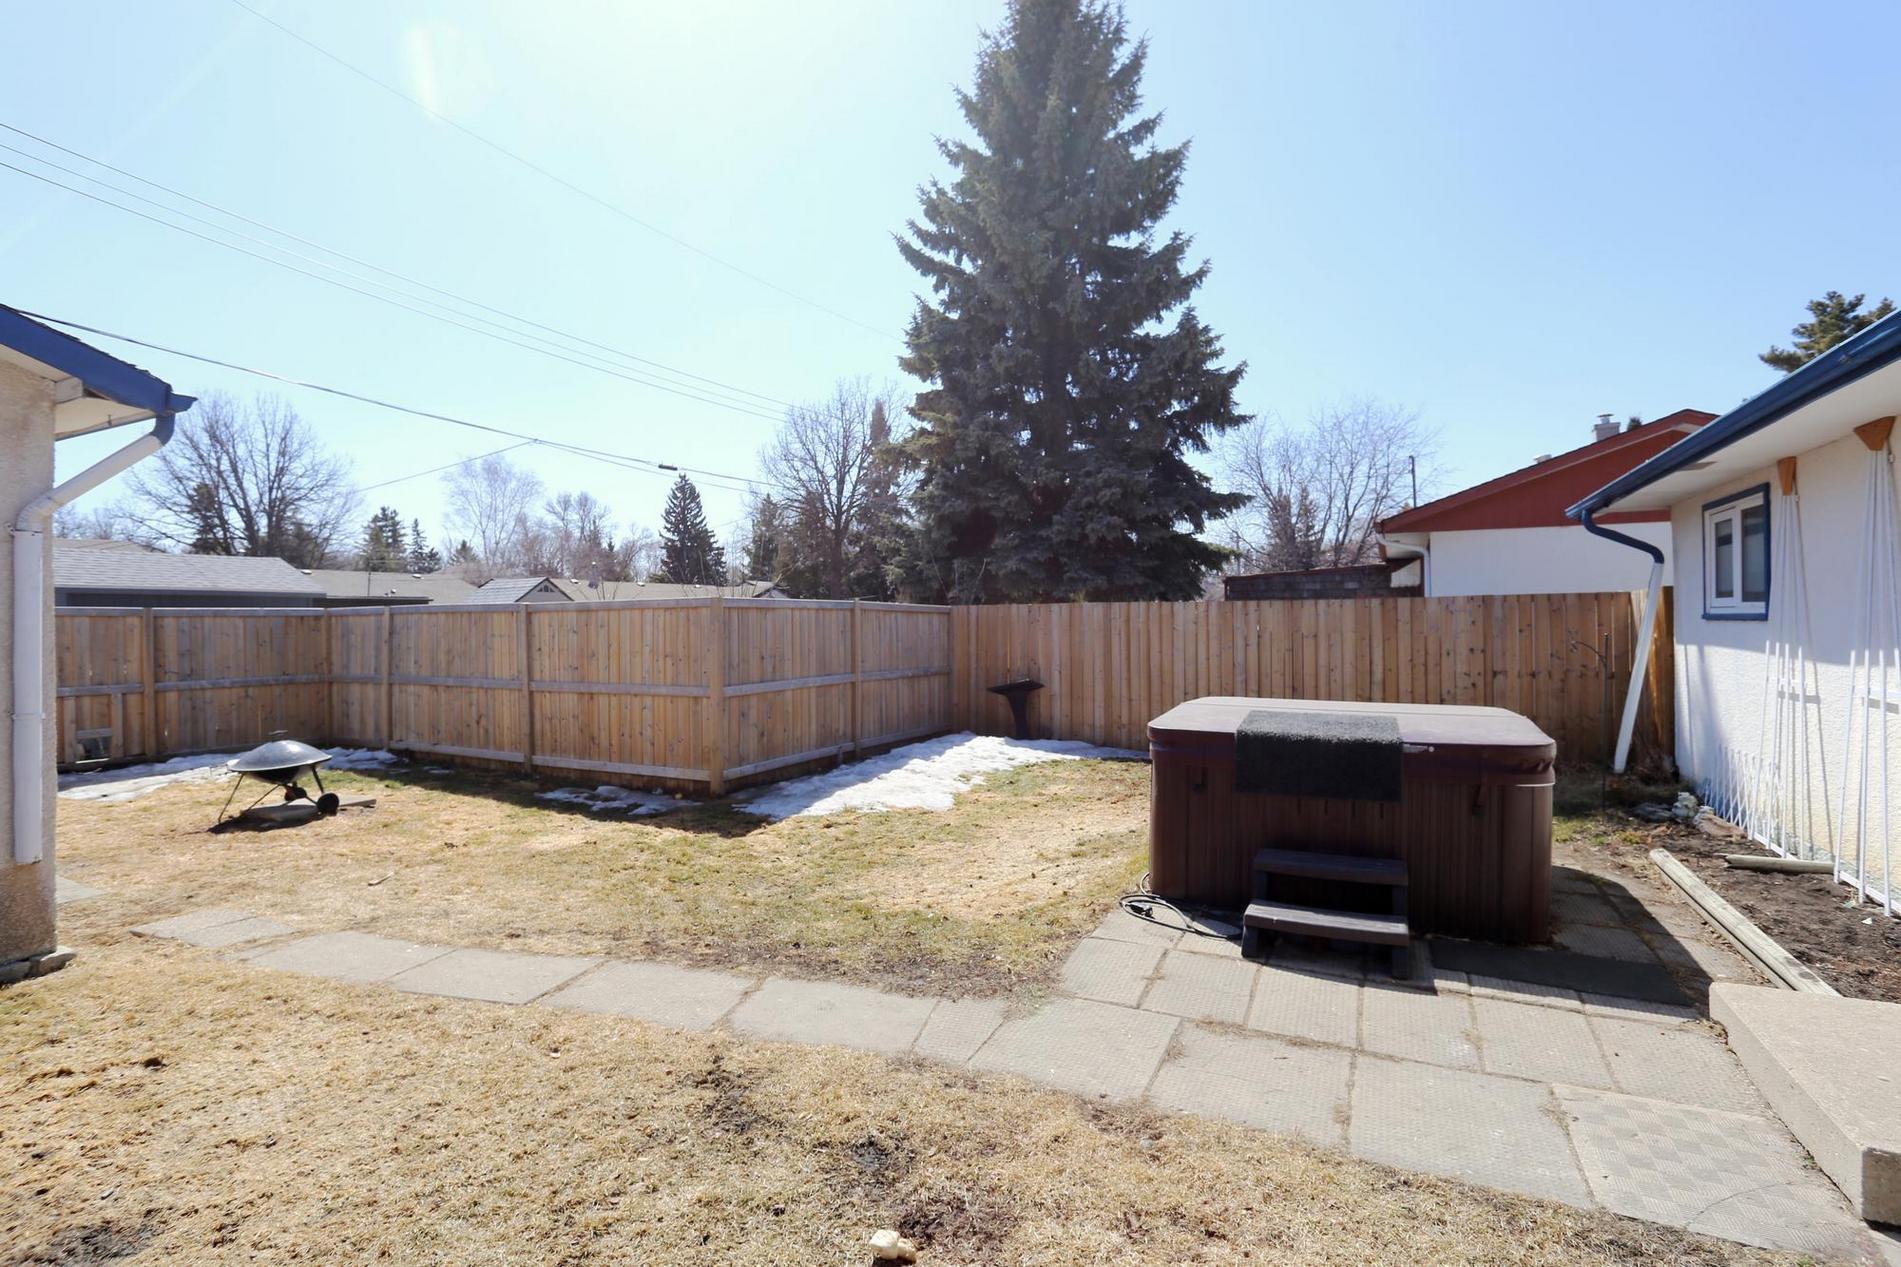 74 Robertson Crescent, Winnipeg, Manitoba  R2M 2N3 - Photo 23 - 1809350